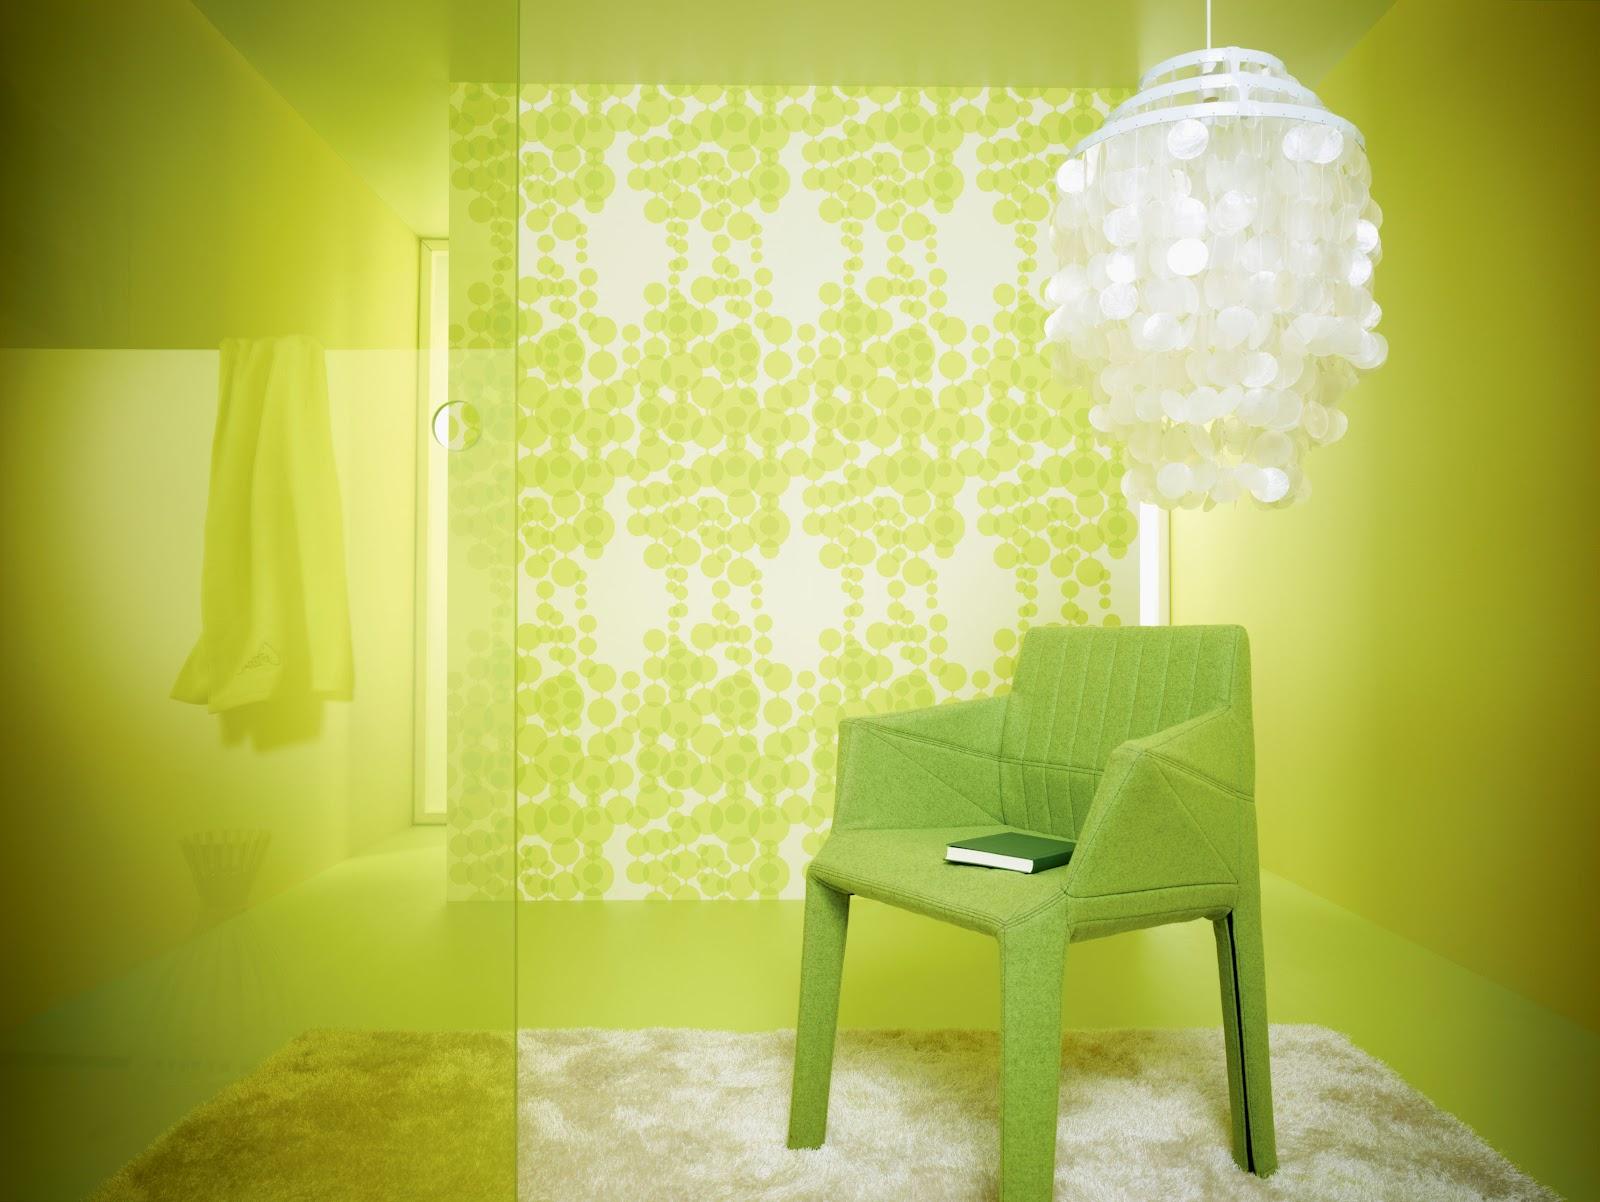 Papeles pintados aribau tienda online de papel pintado - Papel pintado barcelona ...